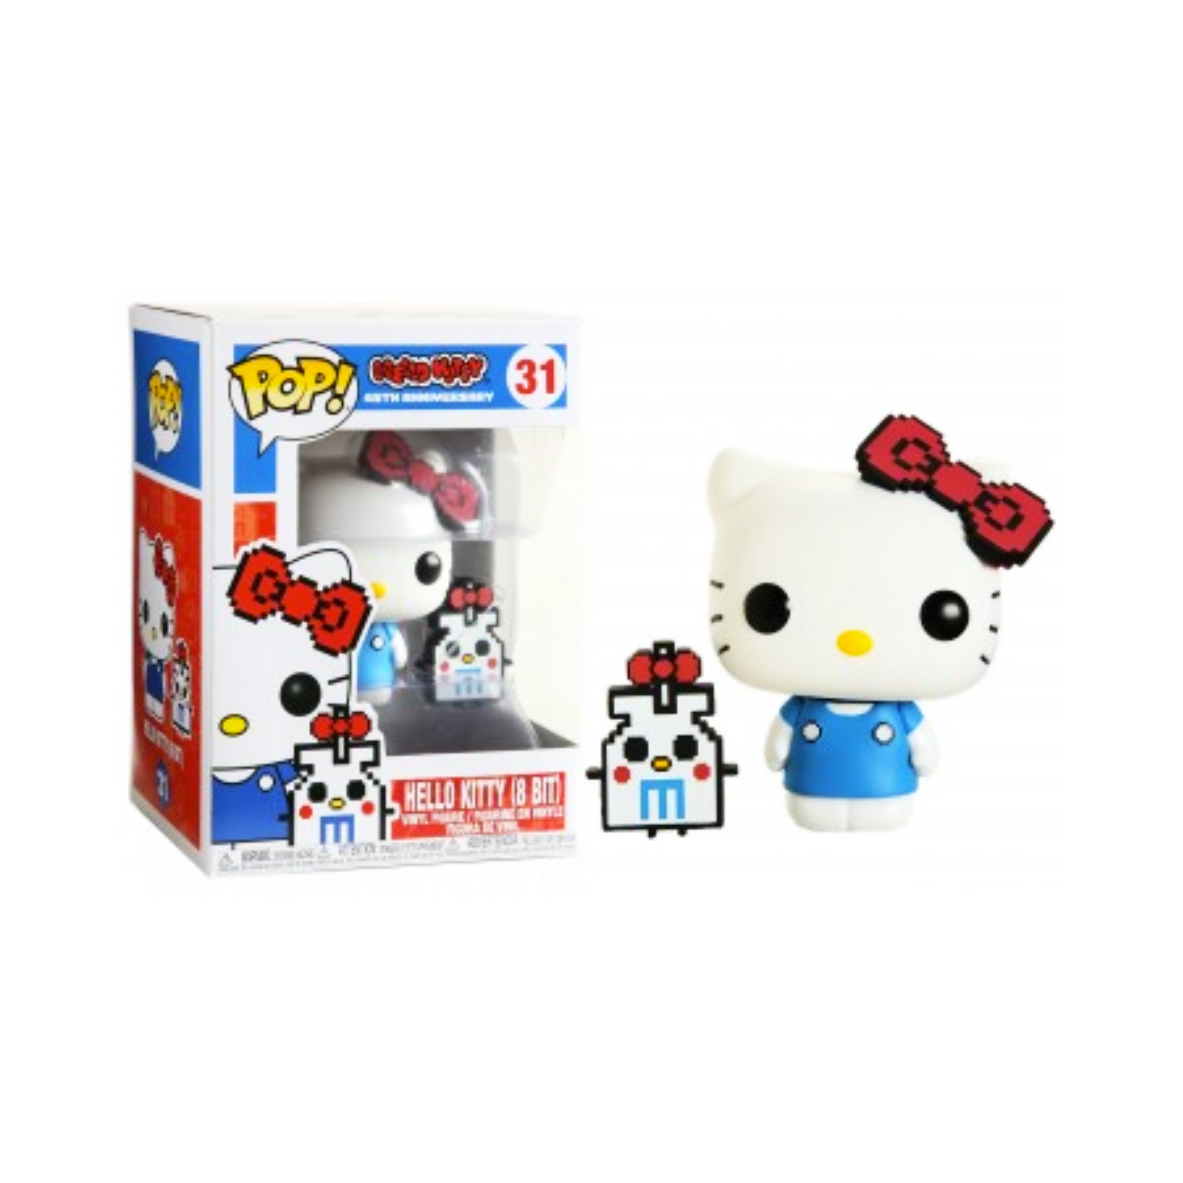 Funko POP! Hello Kitty & Buddy (8Bit) #31